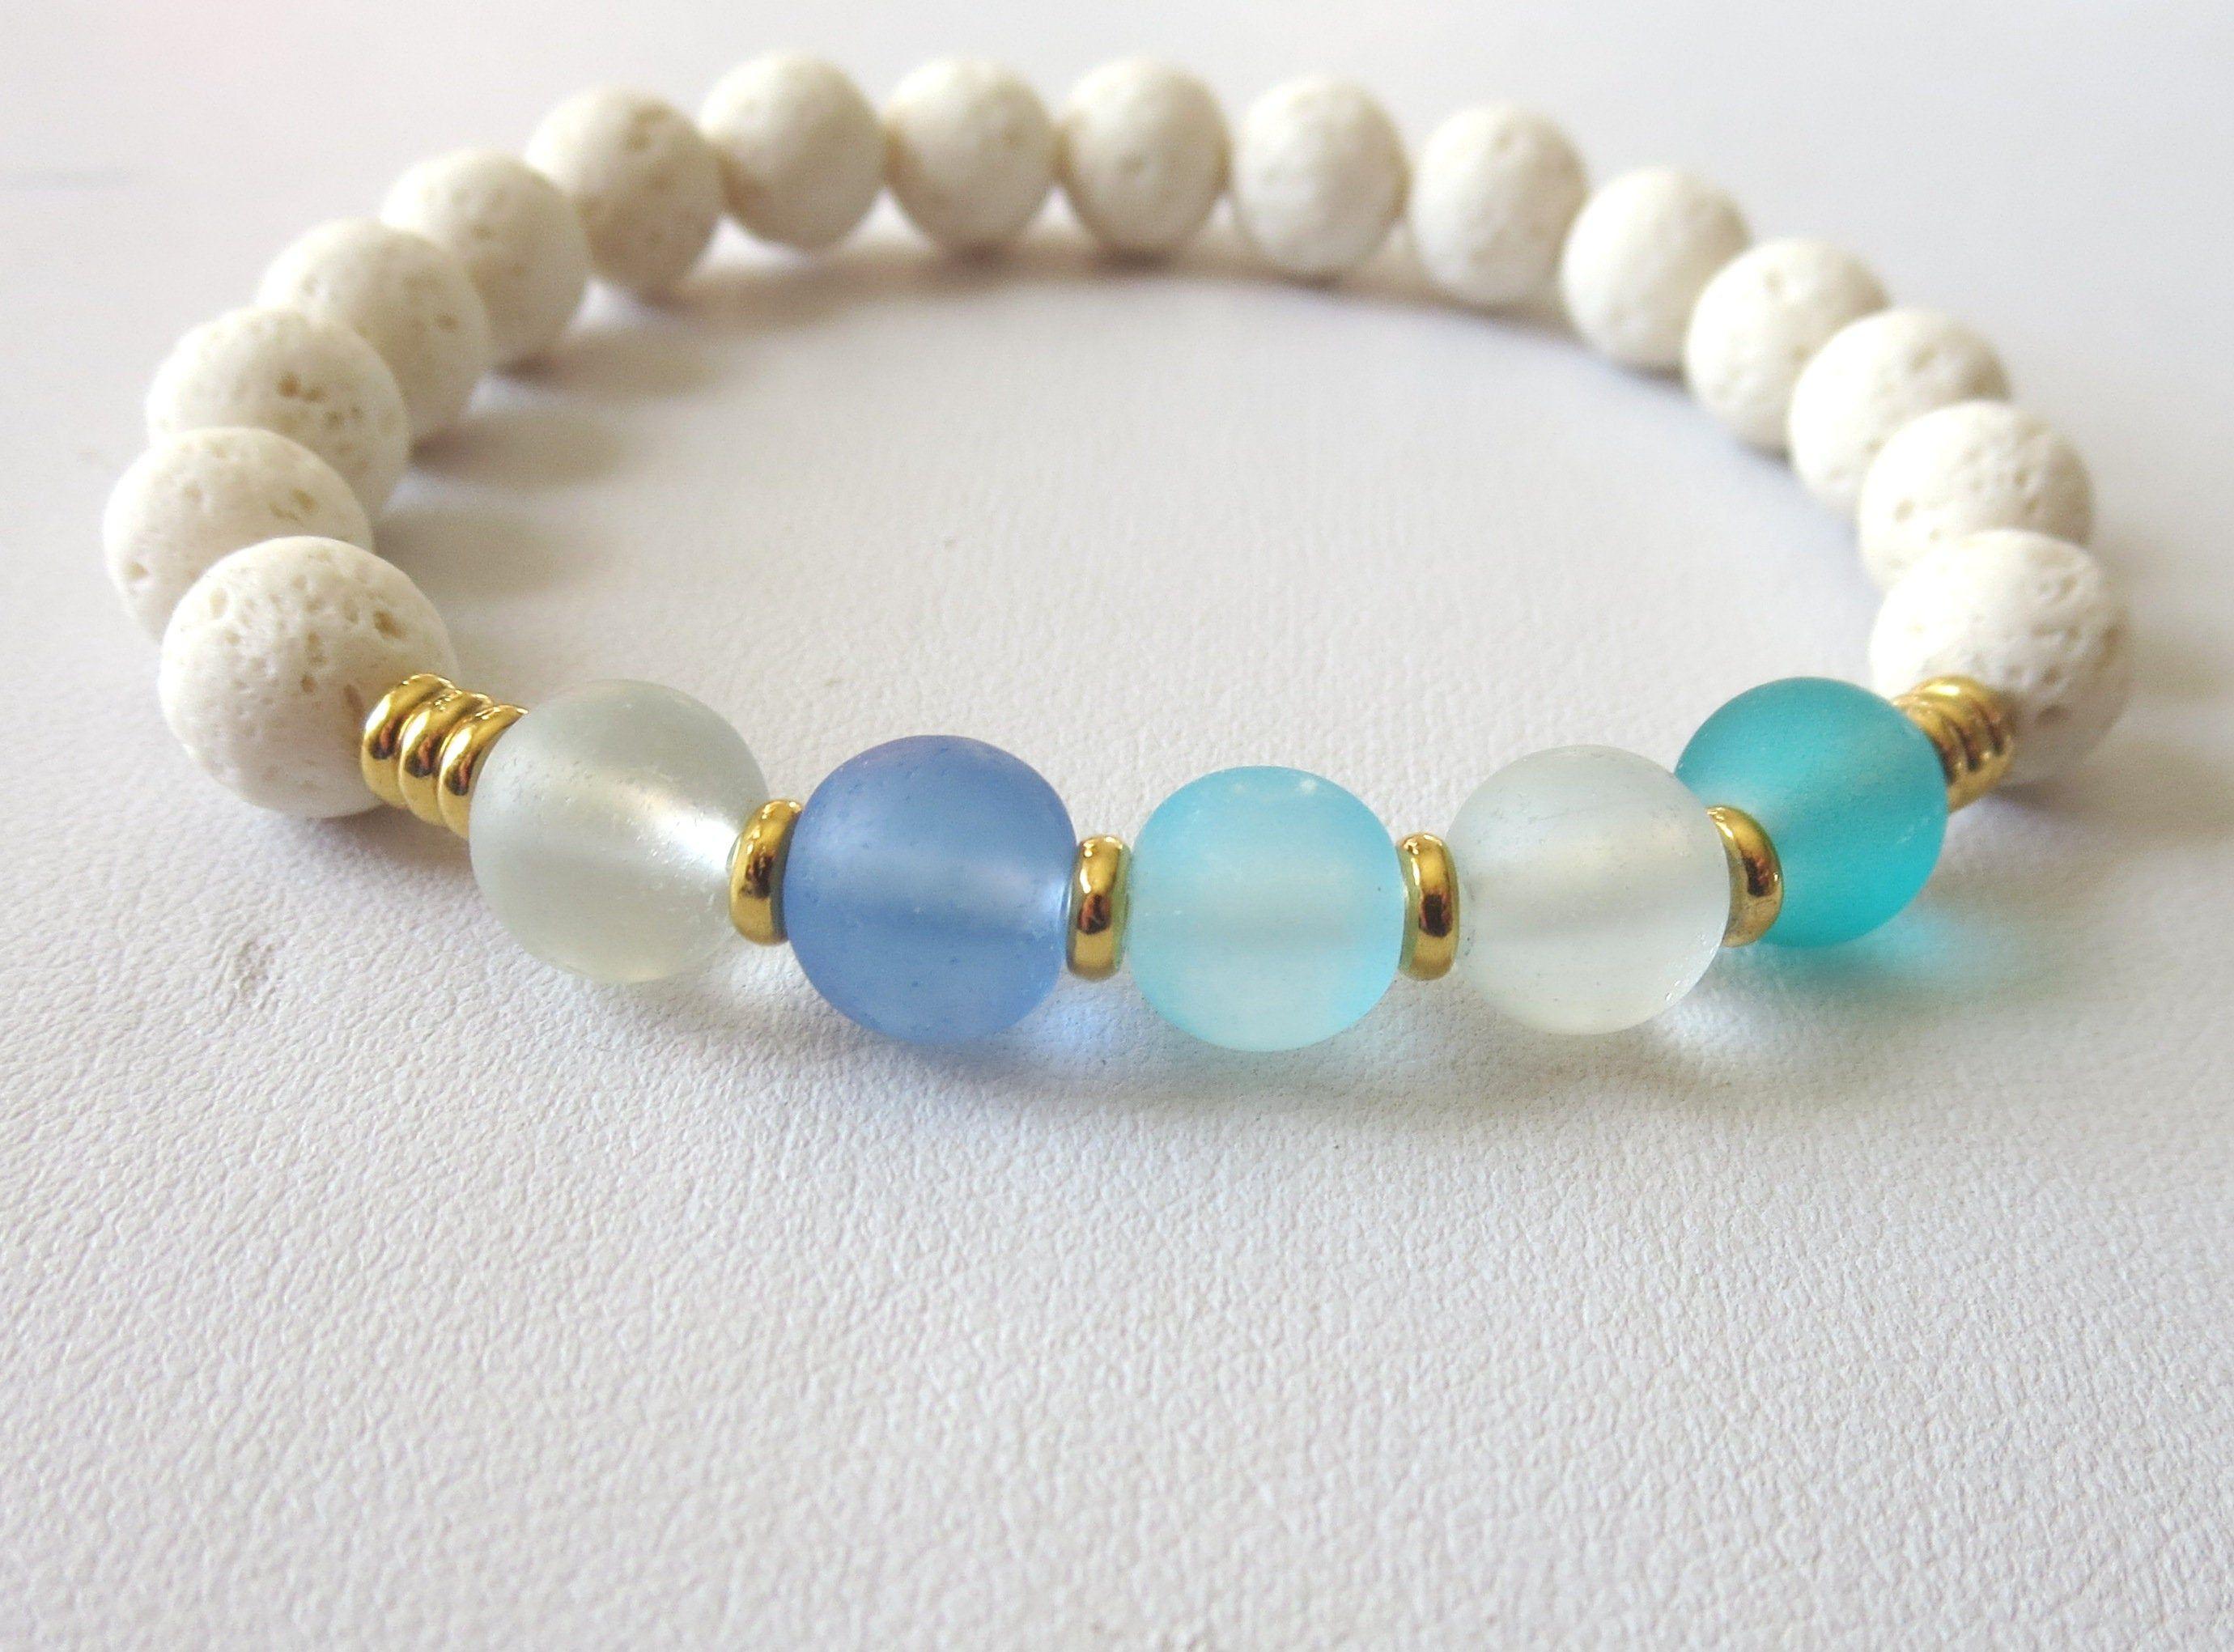 Denim blues stretchy seed bead bracelet or necklace